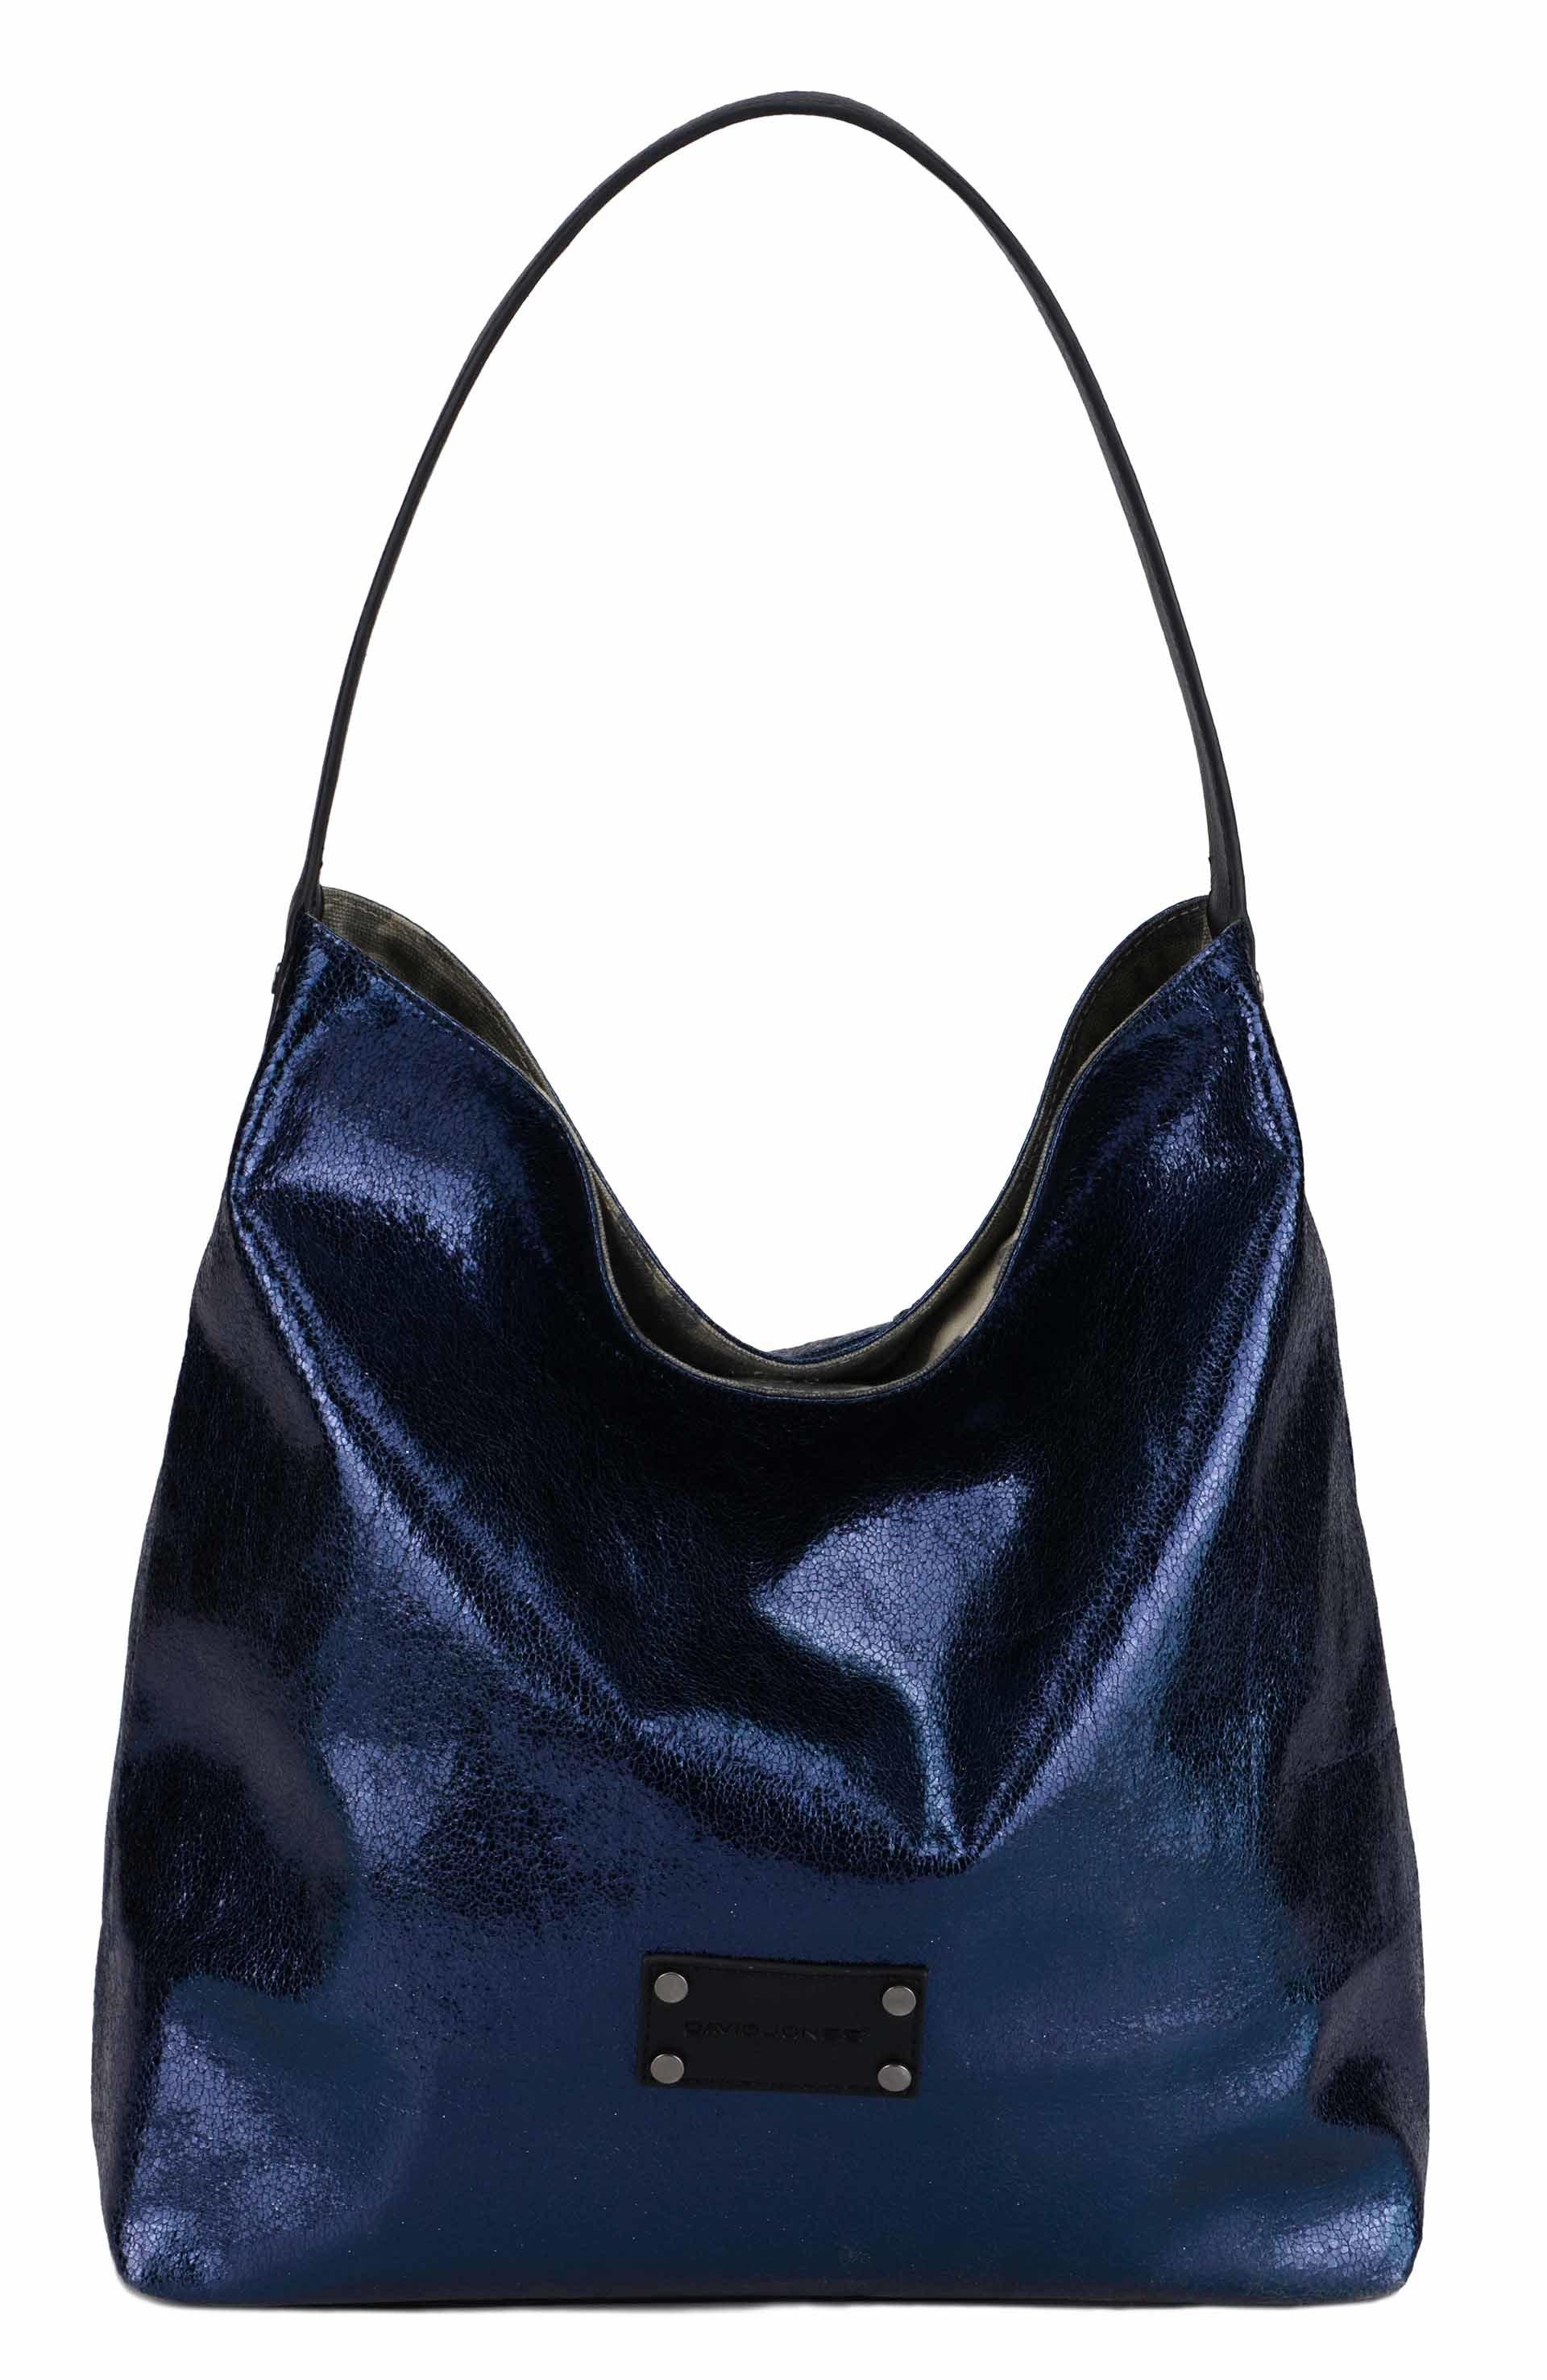 Reversible Pu Canvas Tote Handbag